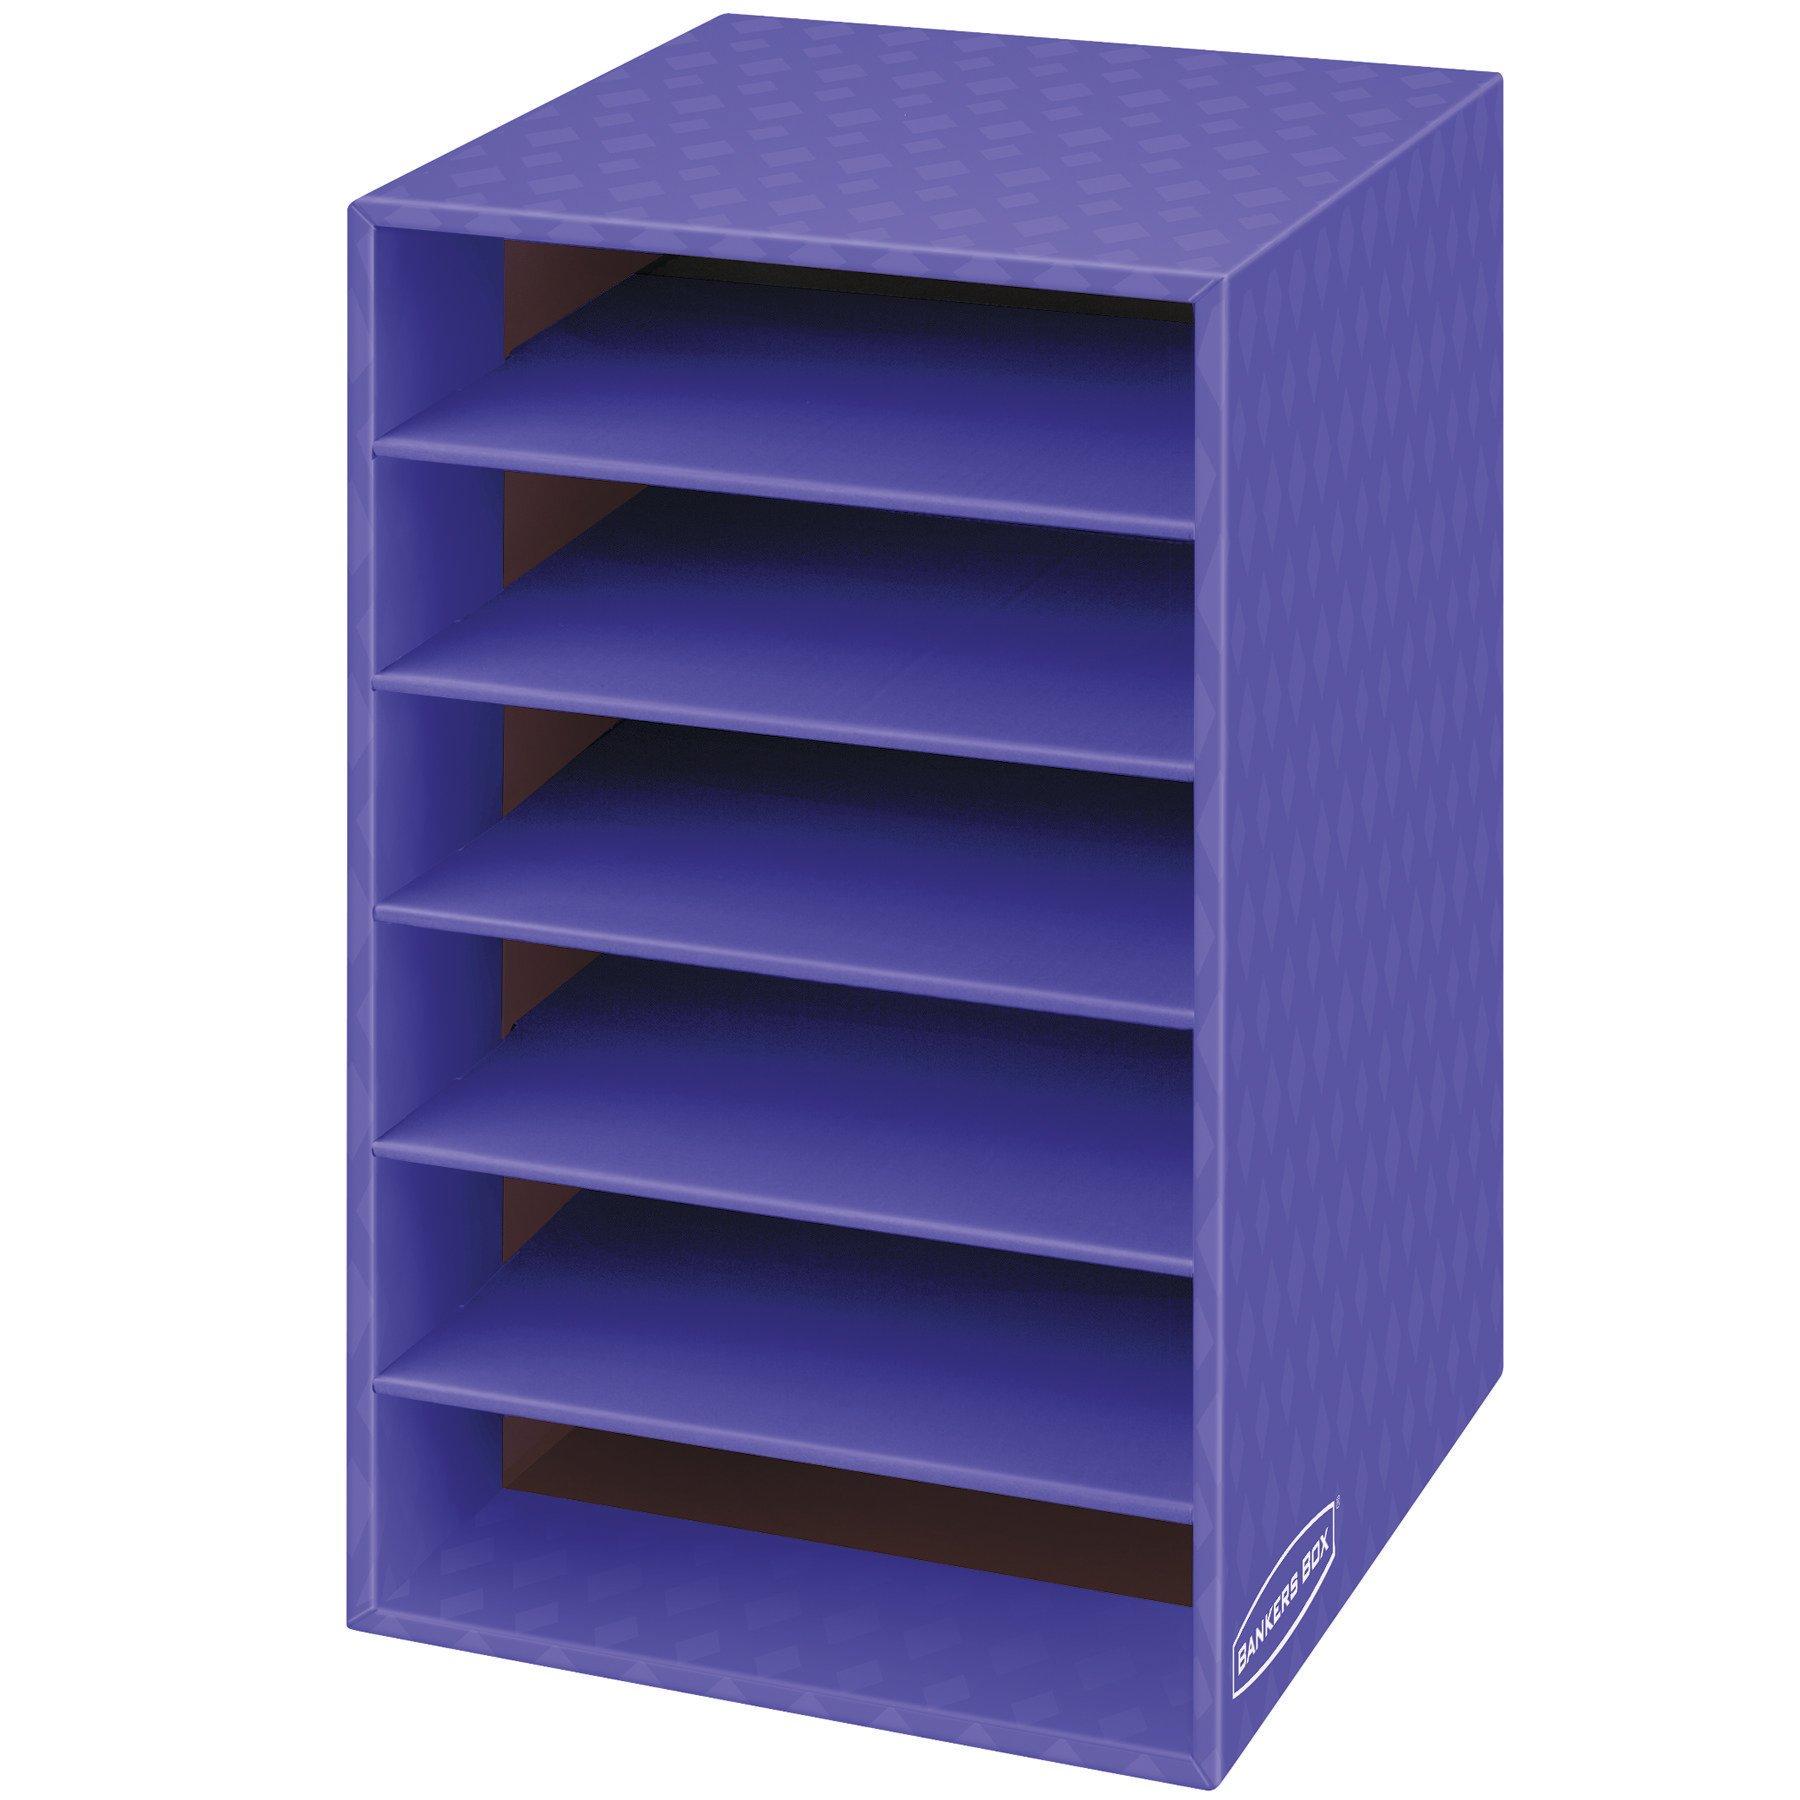 Bankers Box Classroom 6 Shelf Organizer 18''H x 12''W x 13 1/4''D (3381201)